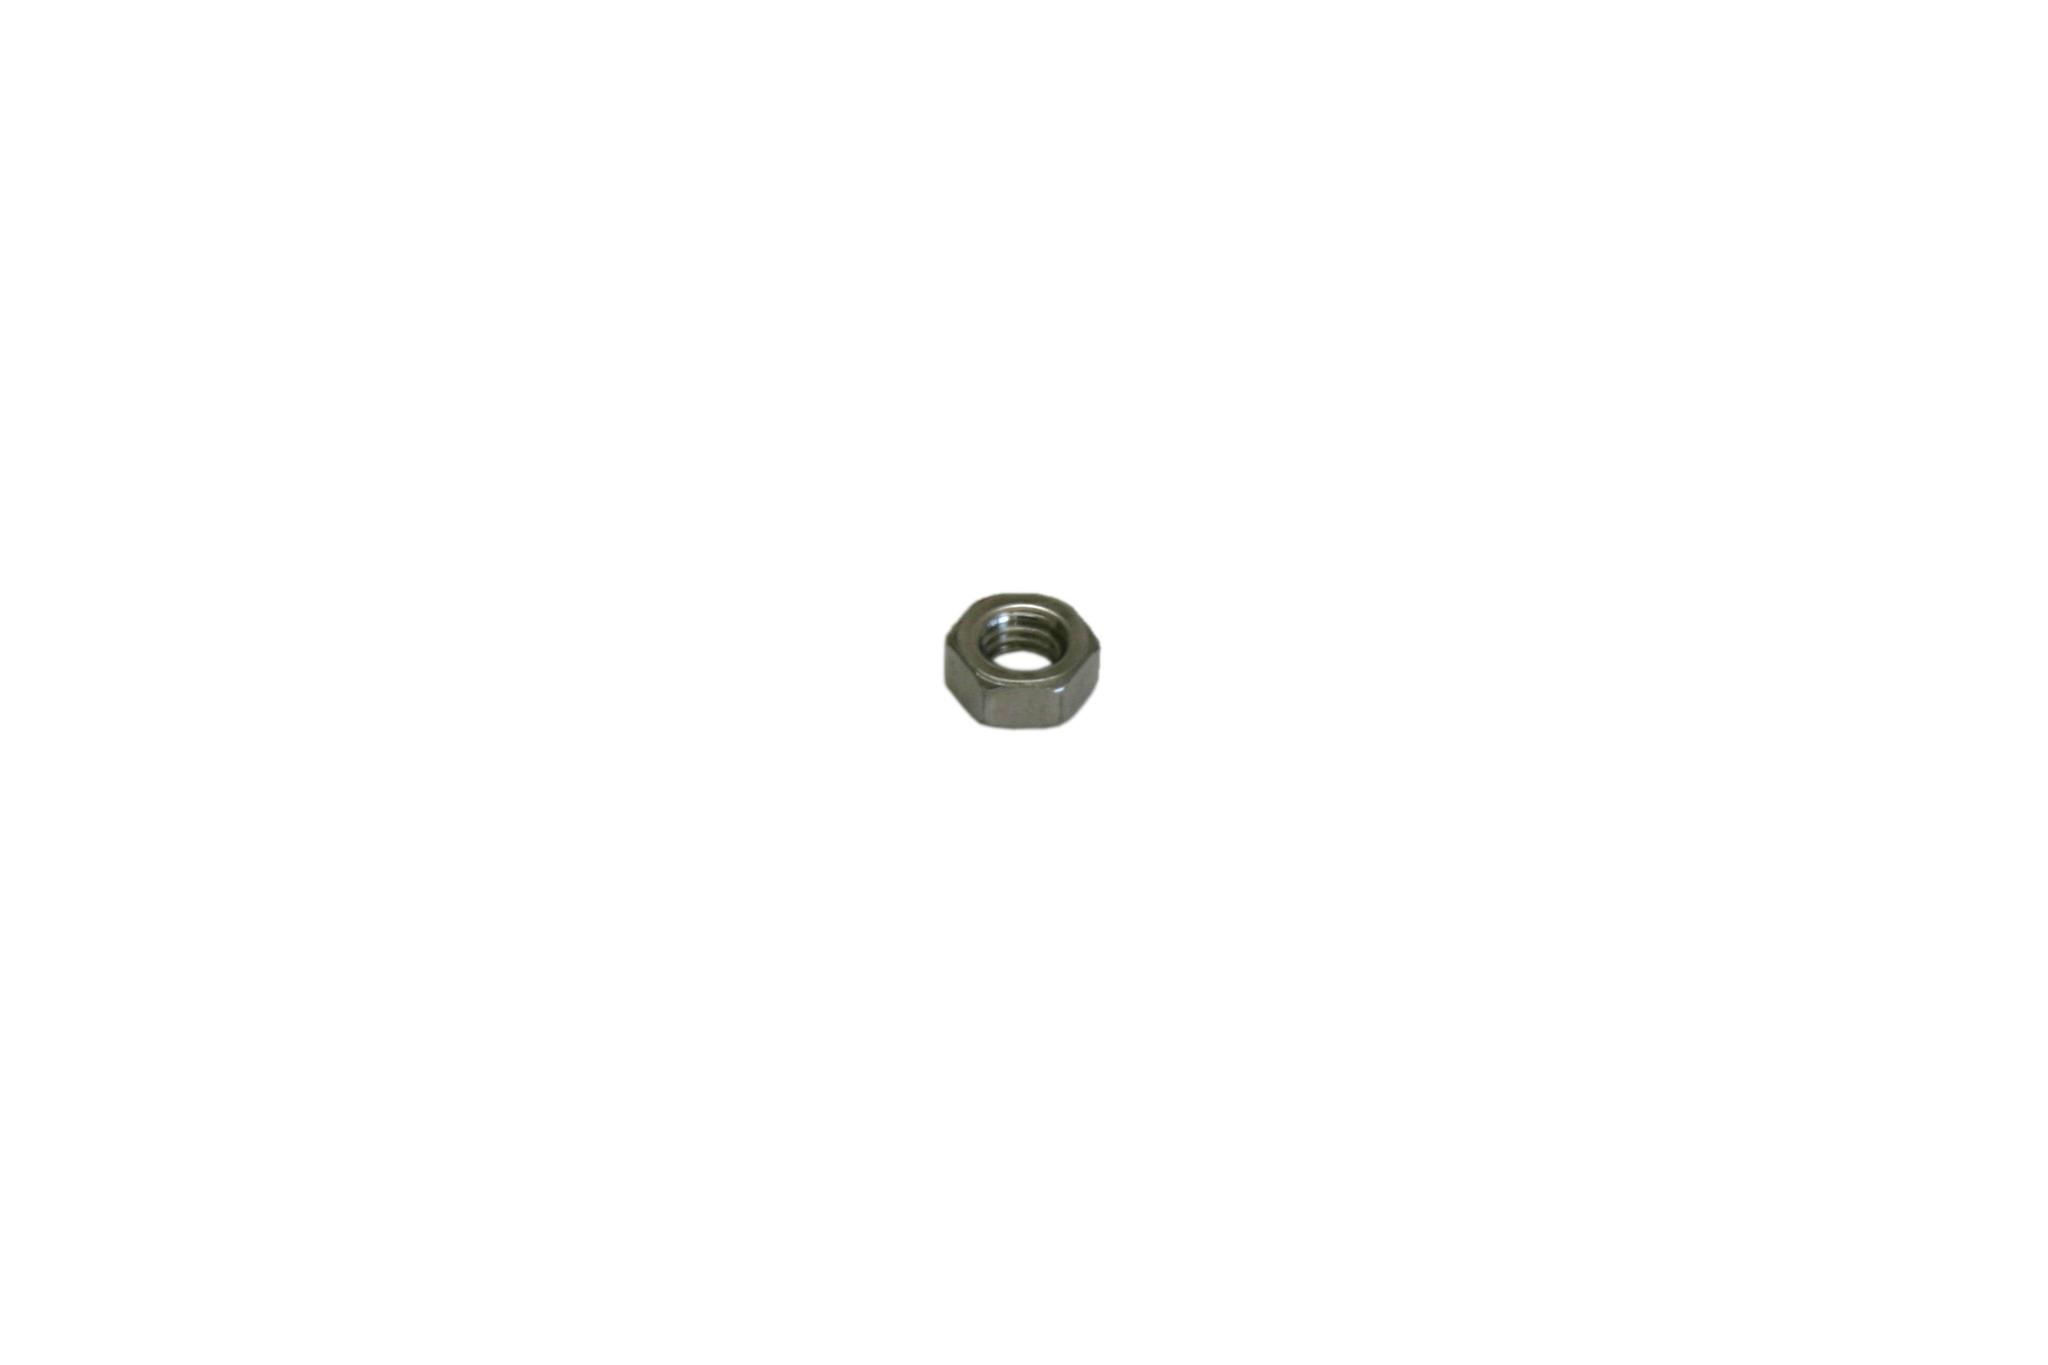 M4 Nut